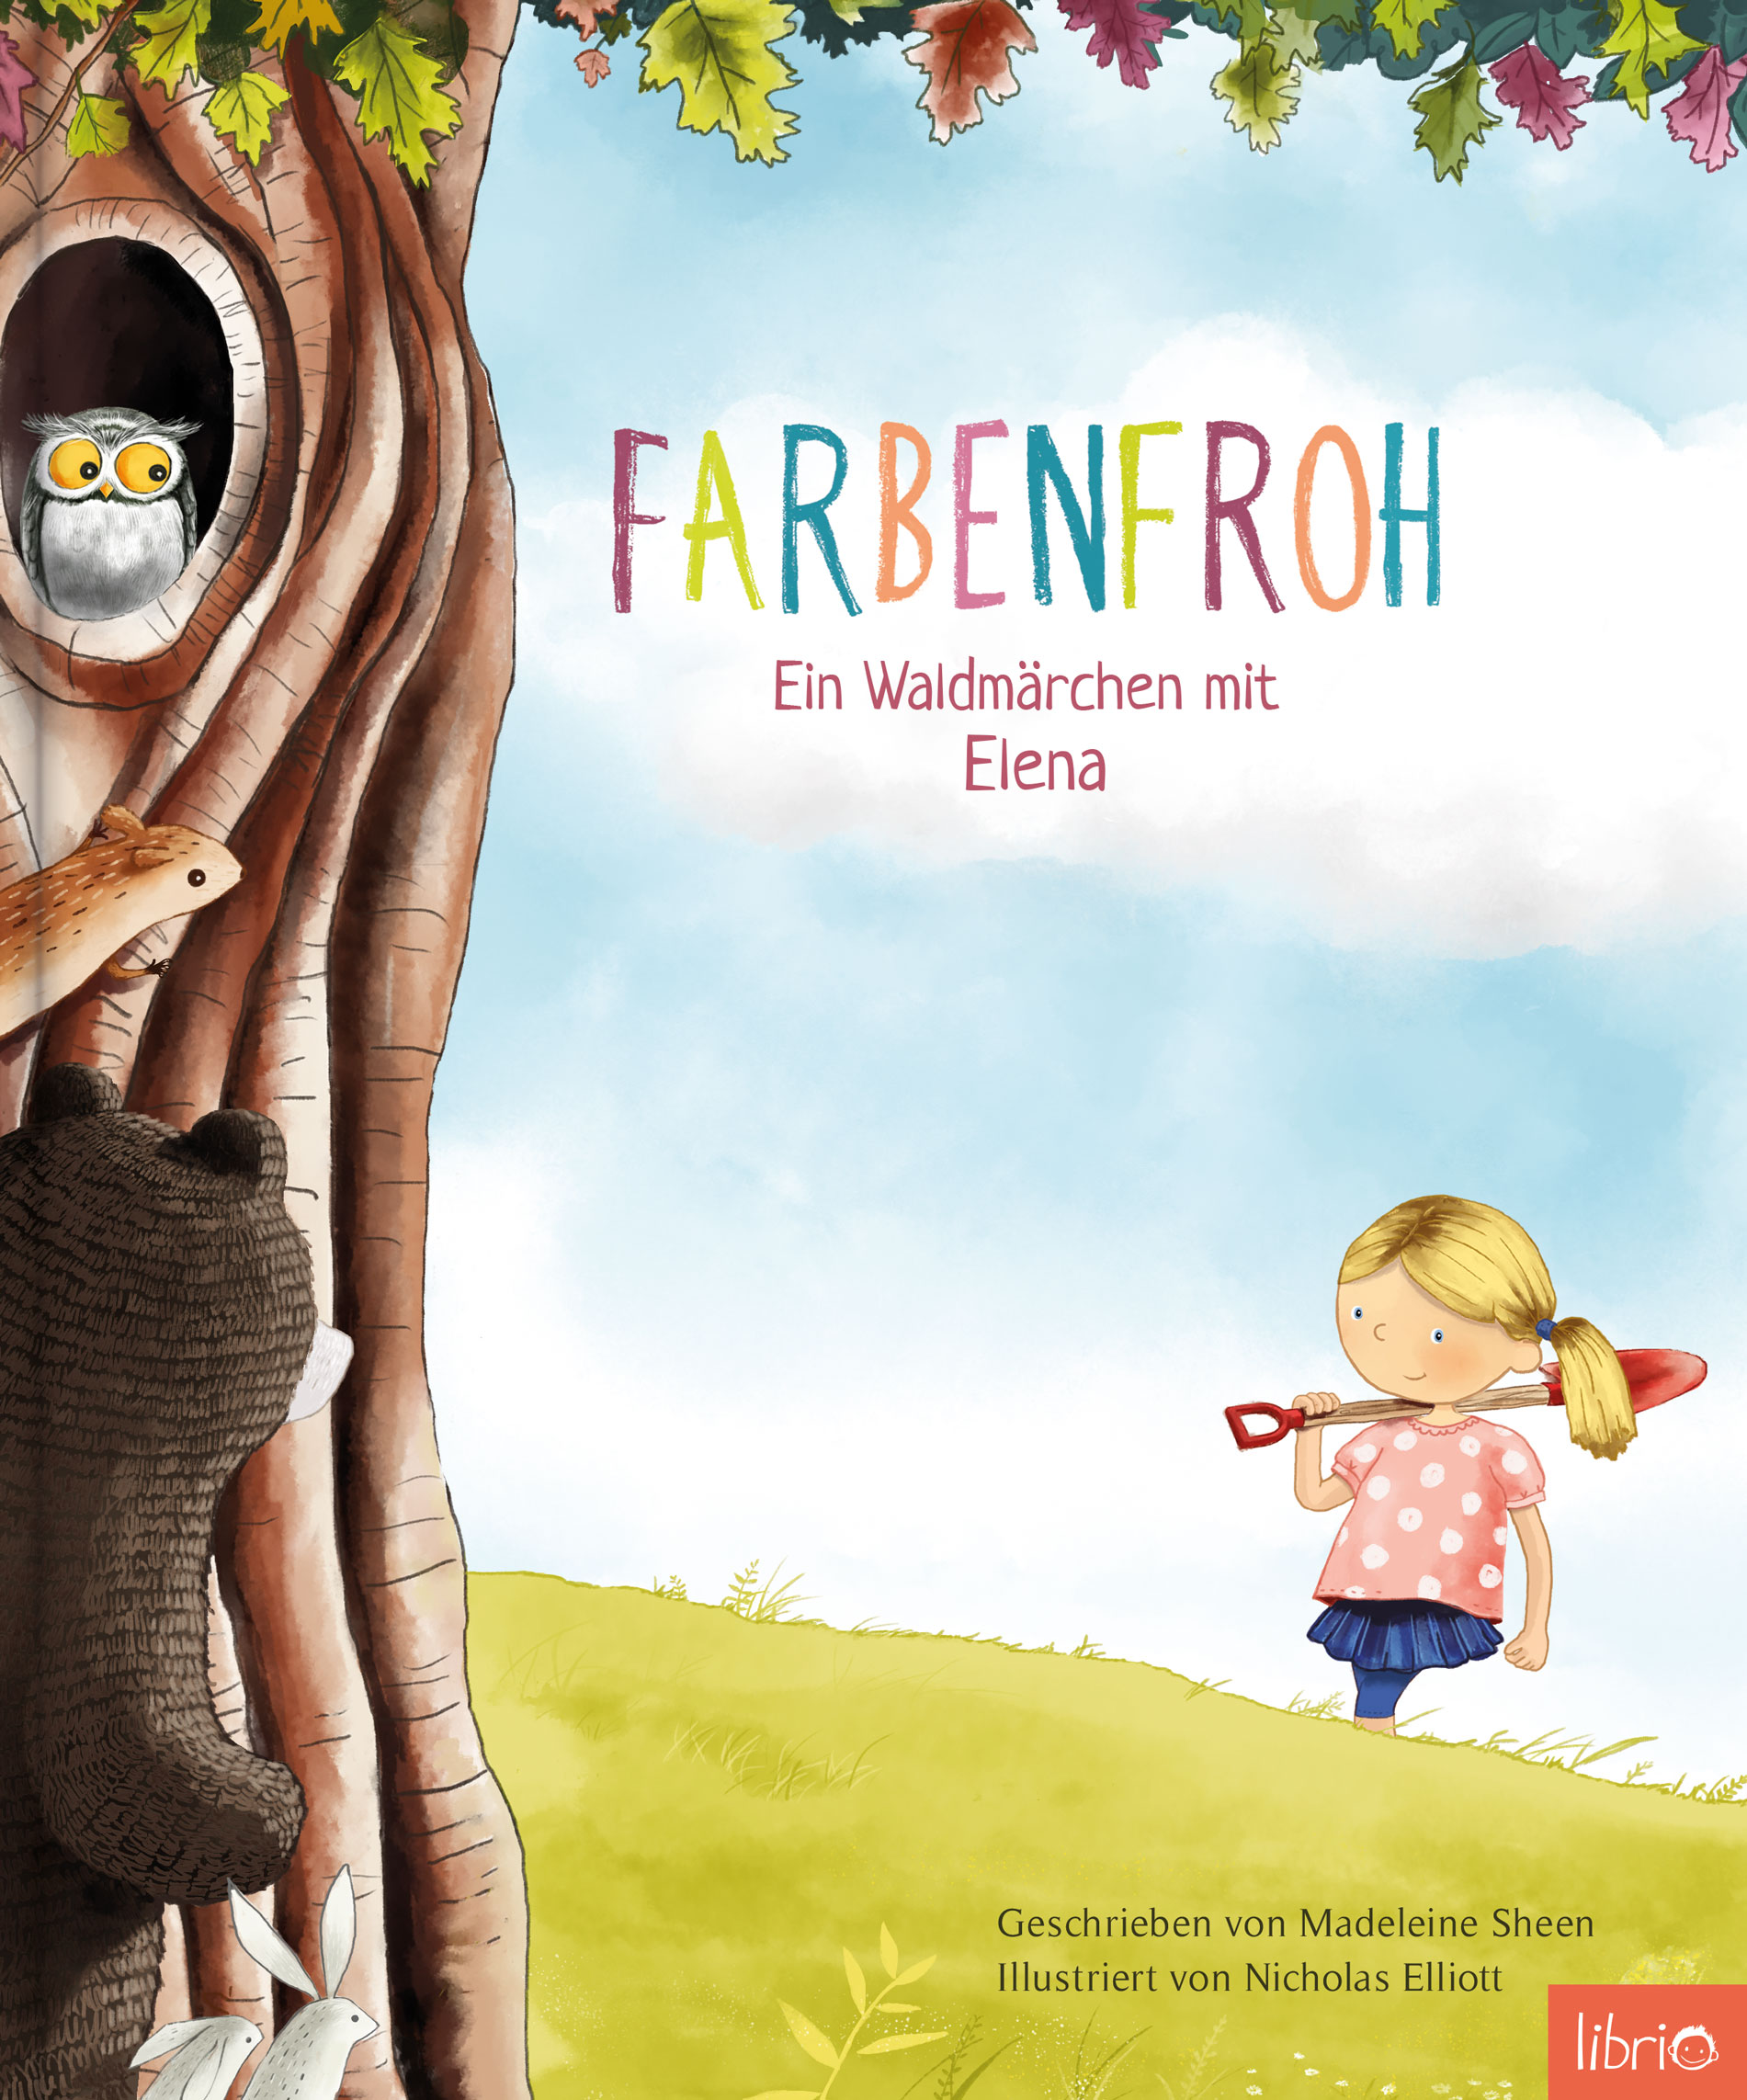 Image of Personalisierte Kinderbücher - Farbenfroh